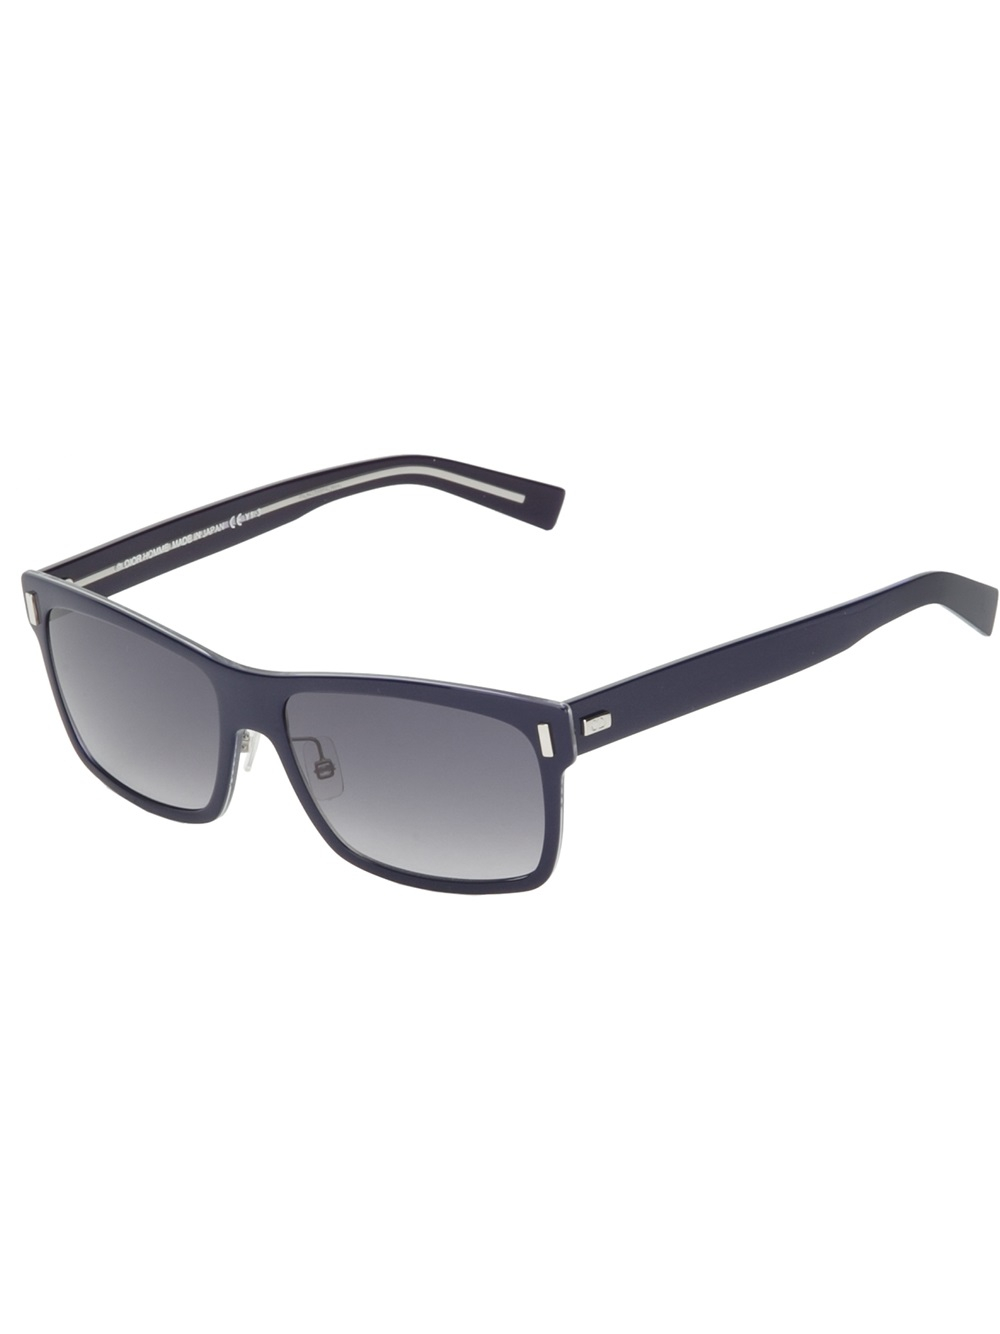 e1445f836879 Lyst - Dior Homme Blacktie 20 Sb Sunglasses in Blue for Men